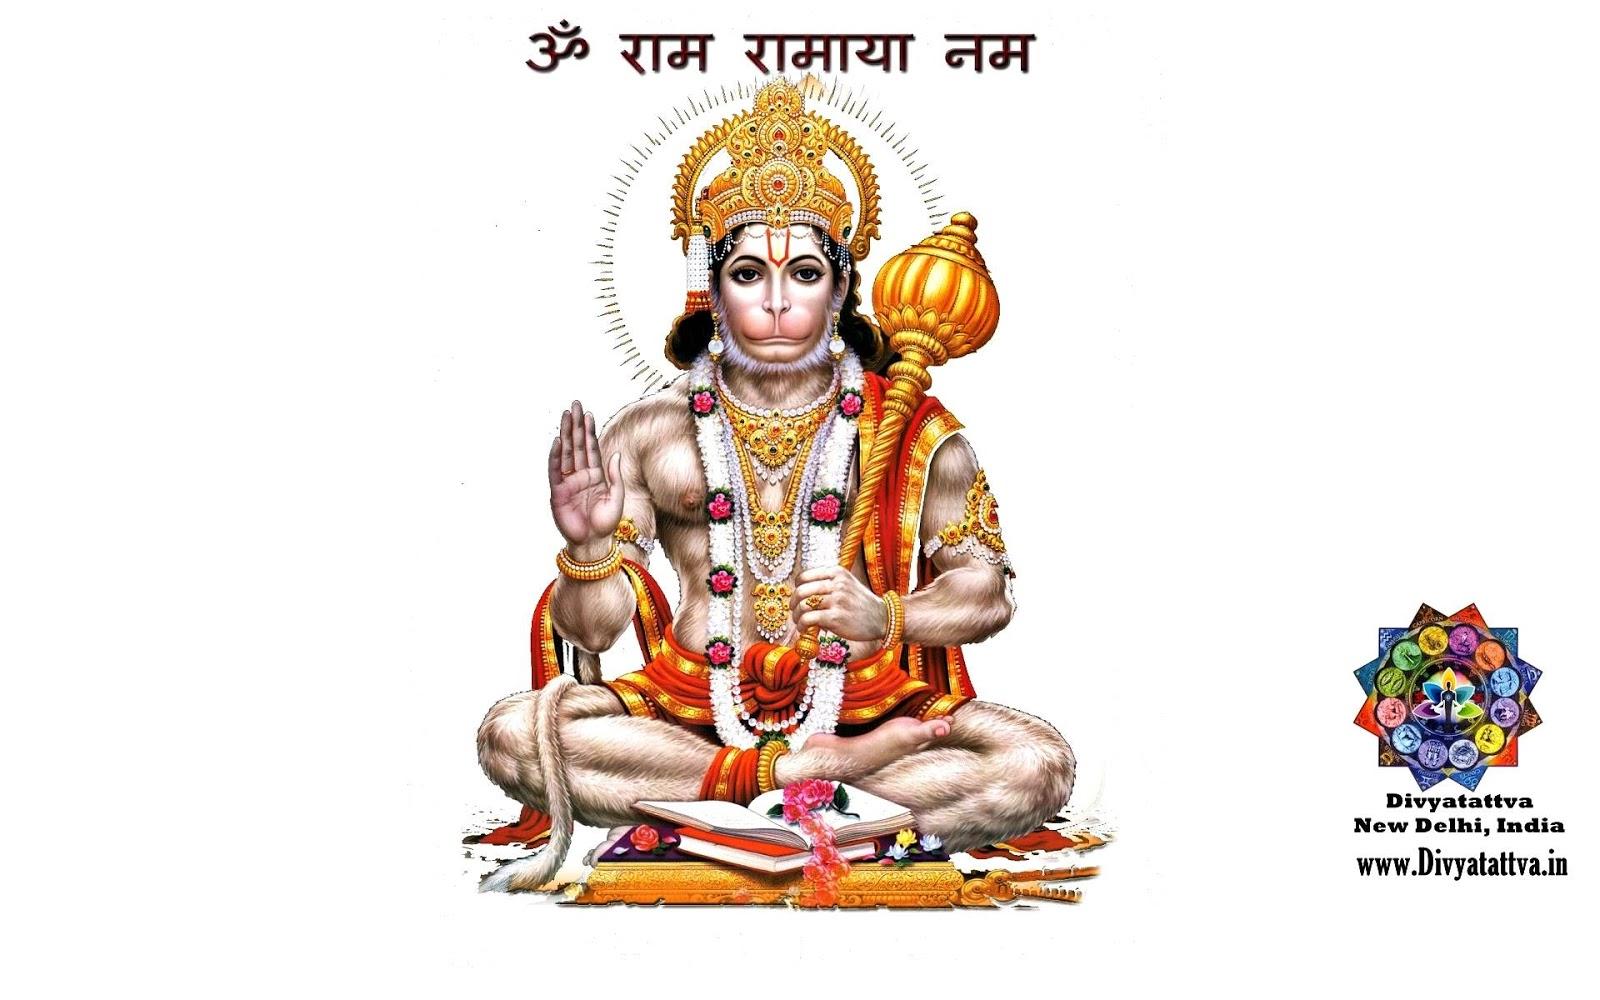 Most Badass Hindu Gods/Goddesses Part I : Hanuman | The Hindu FAQs